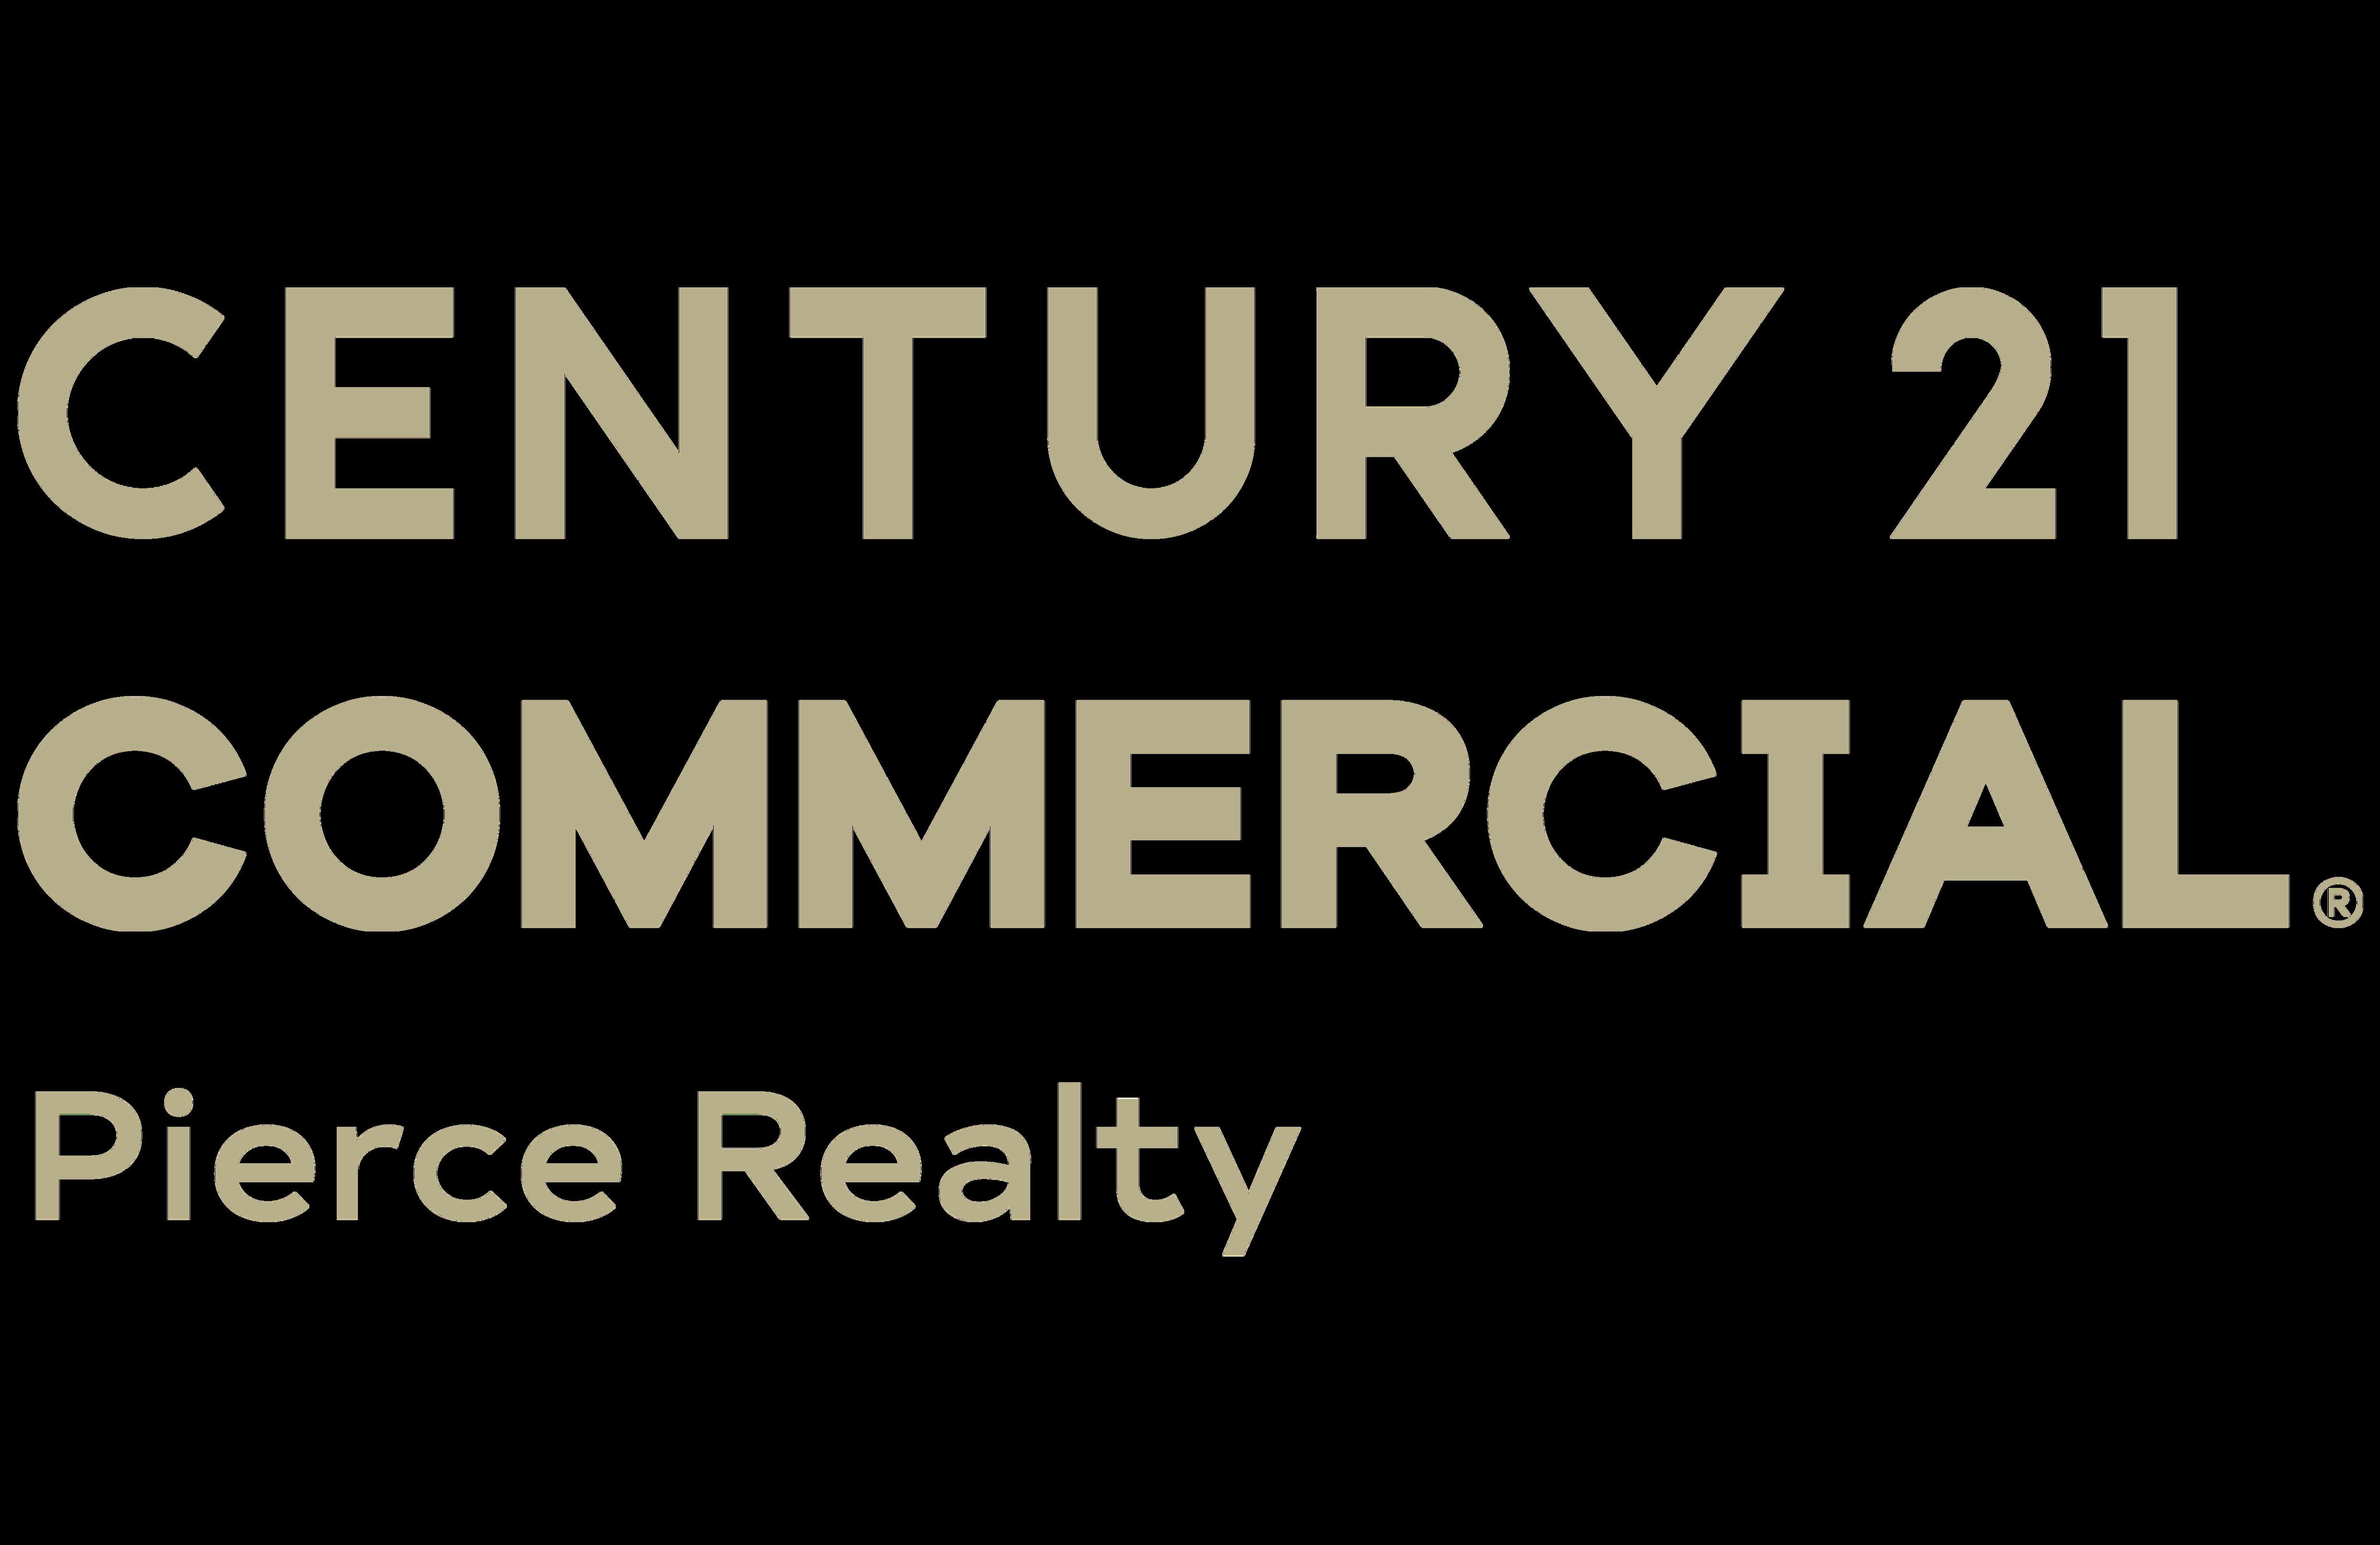 CENTURY 21 Pierce Realty